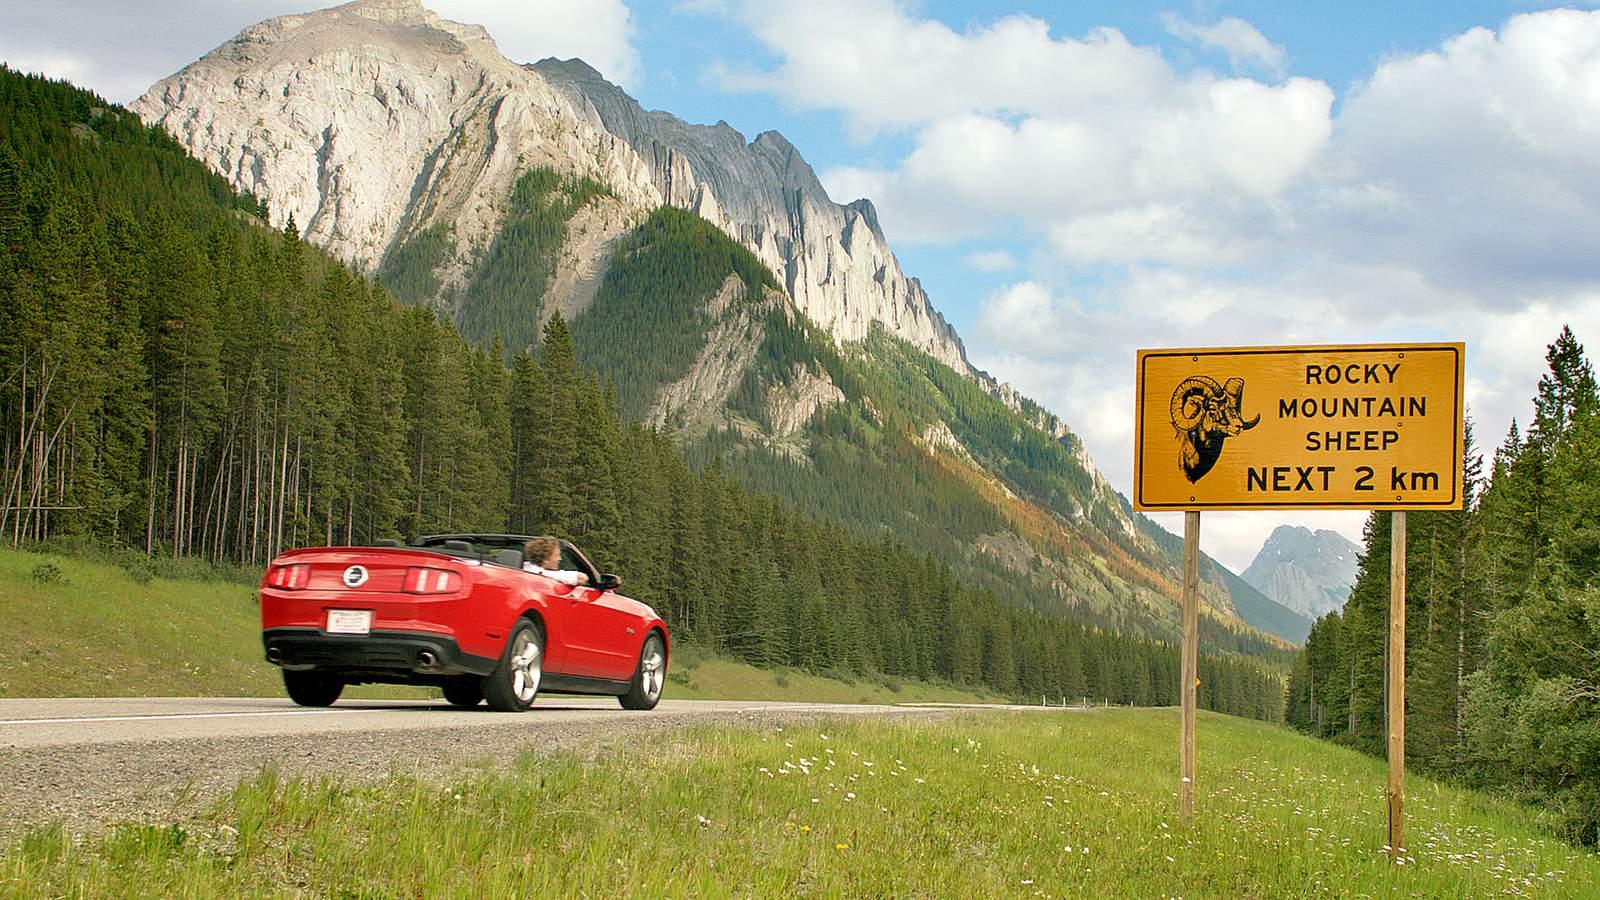 Strassenschild im Bow Valley Provincial Park, Kananaskis Country, Alberta